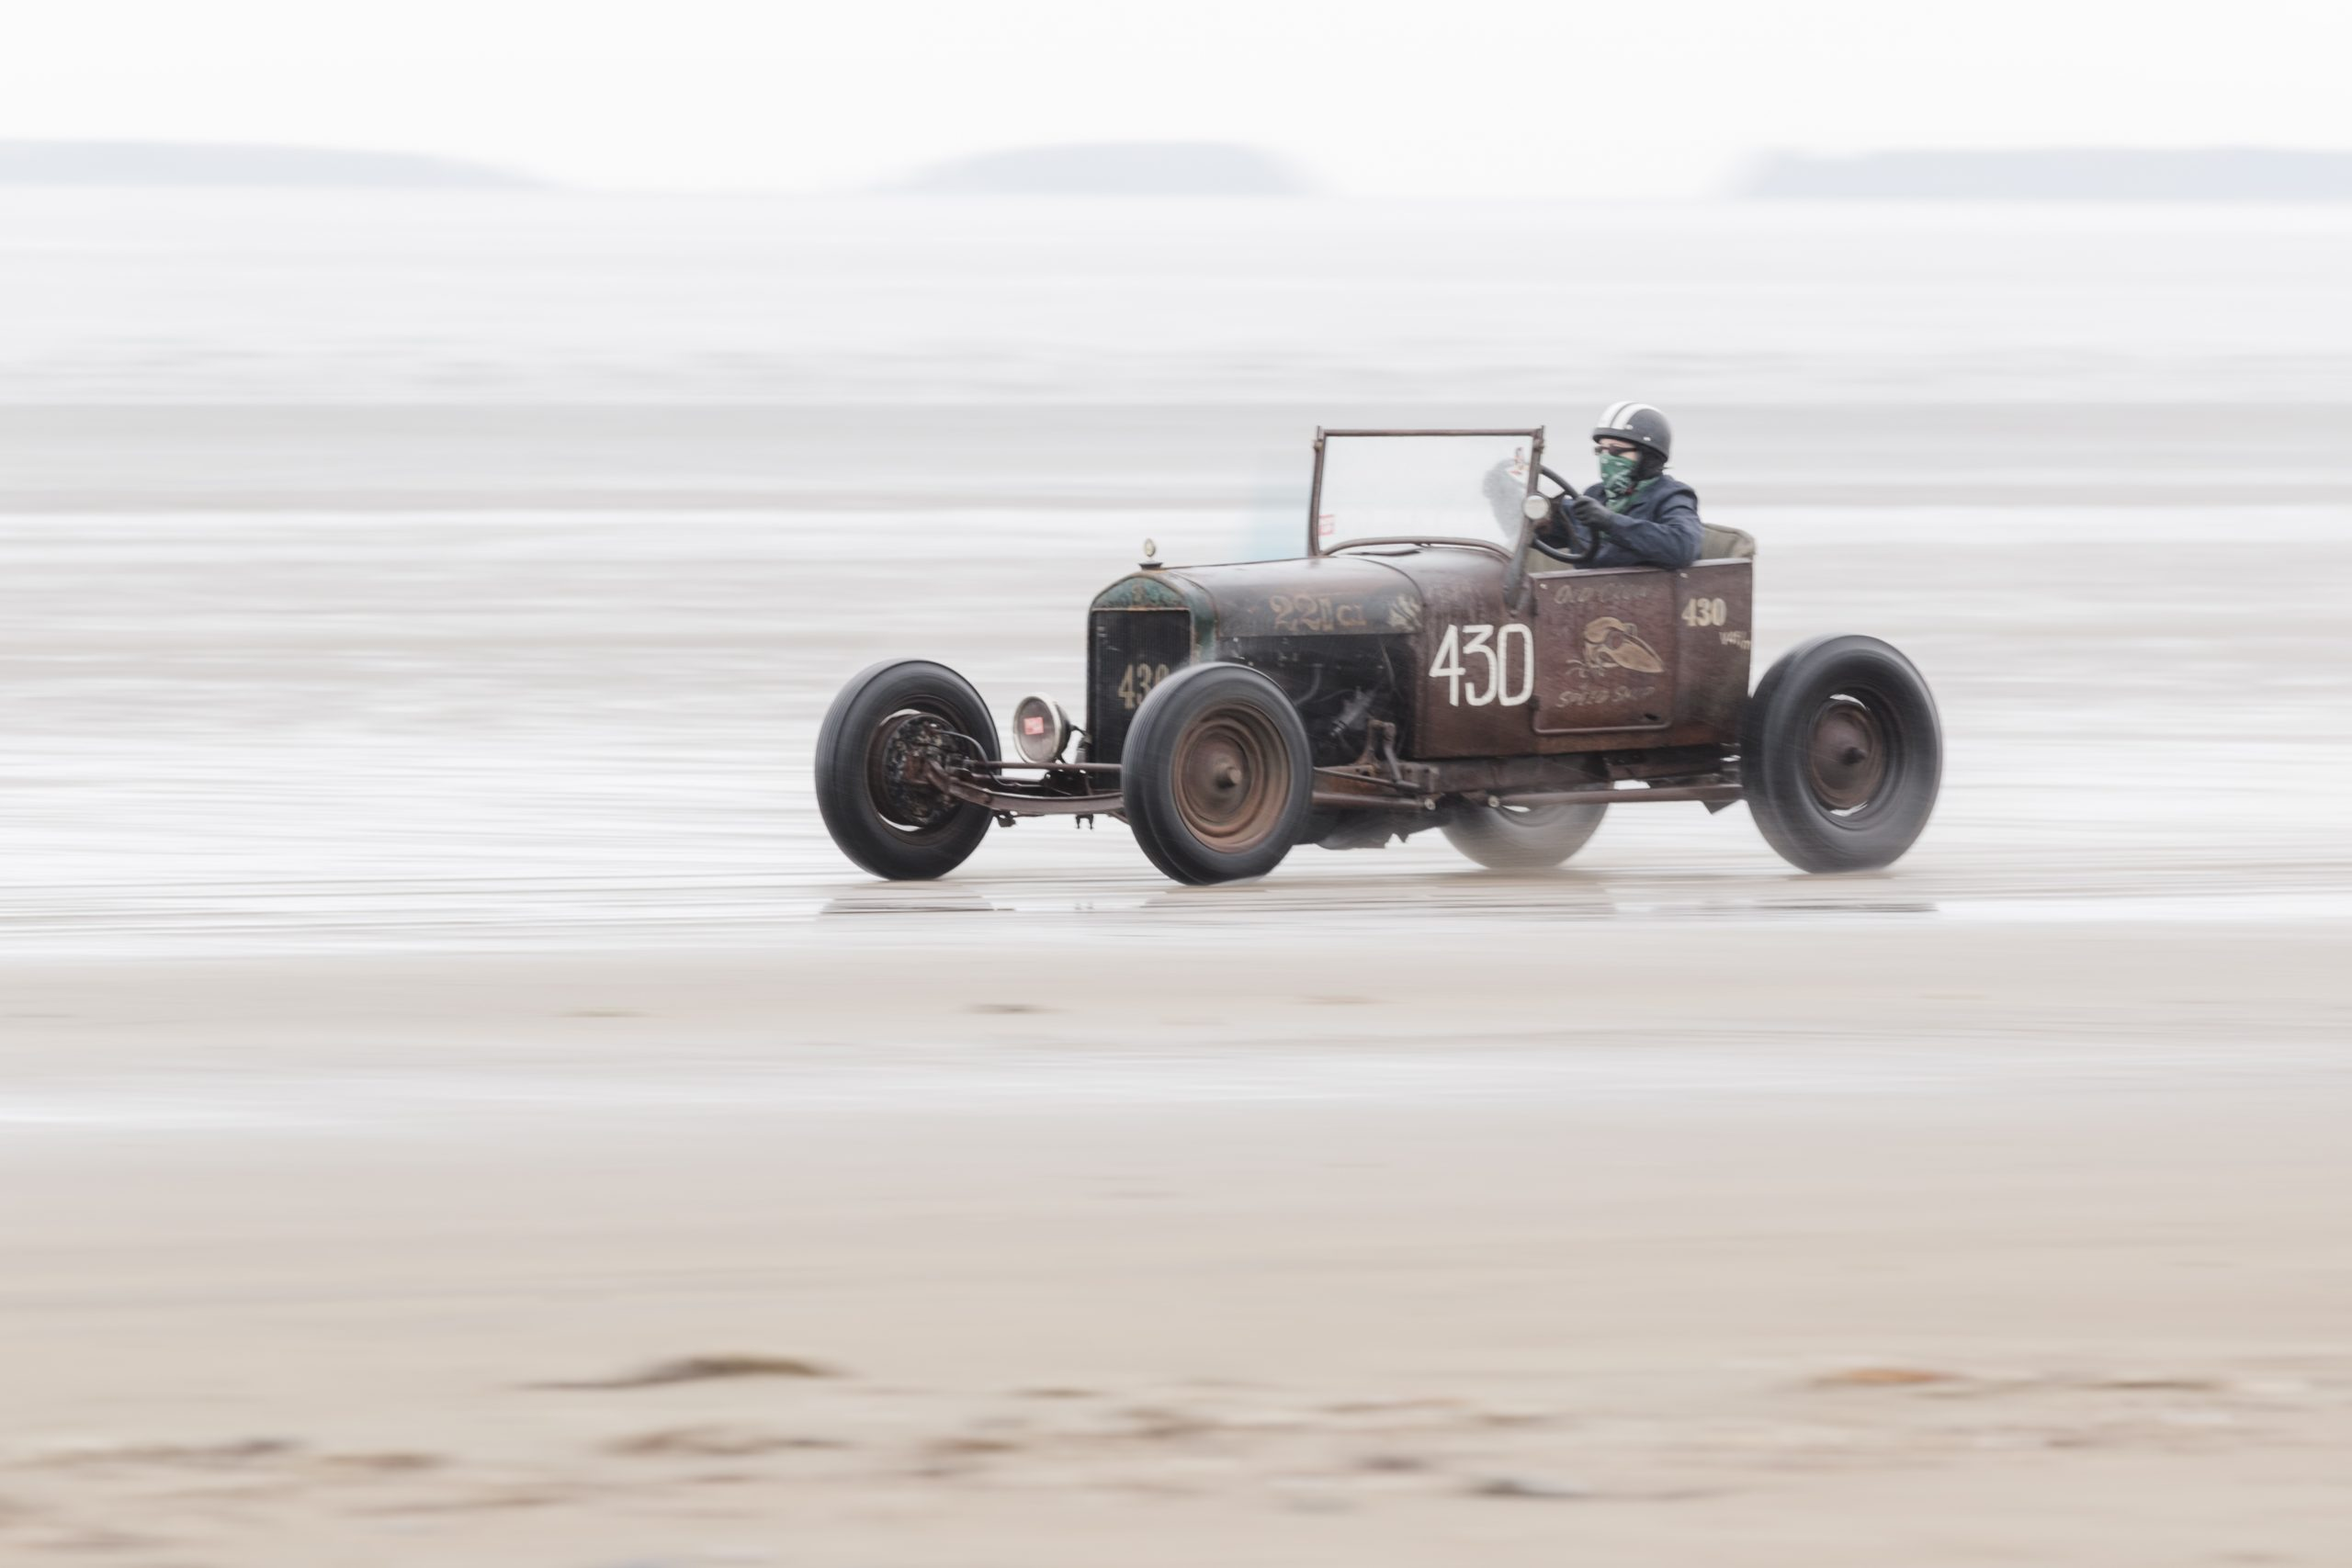 Pendine Sands hot rod racing on beach action